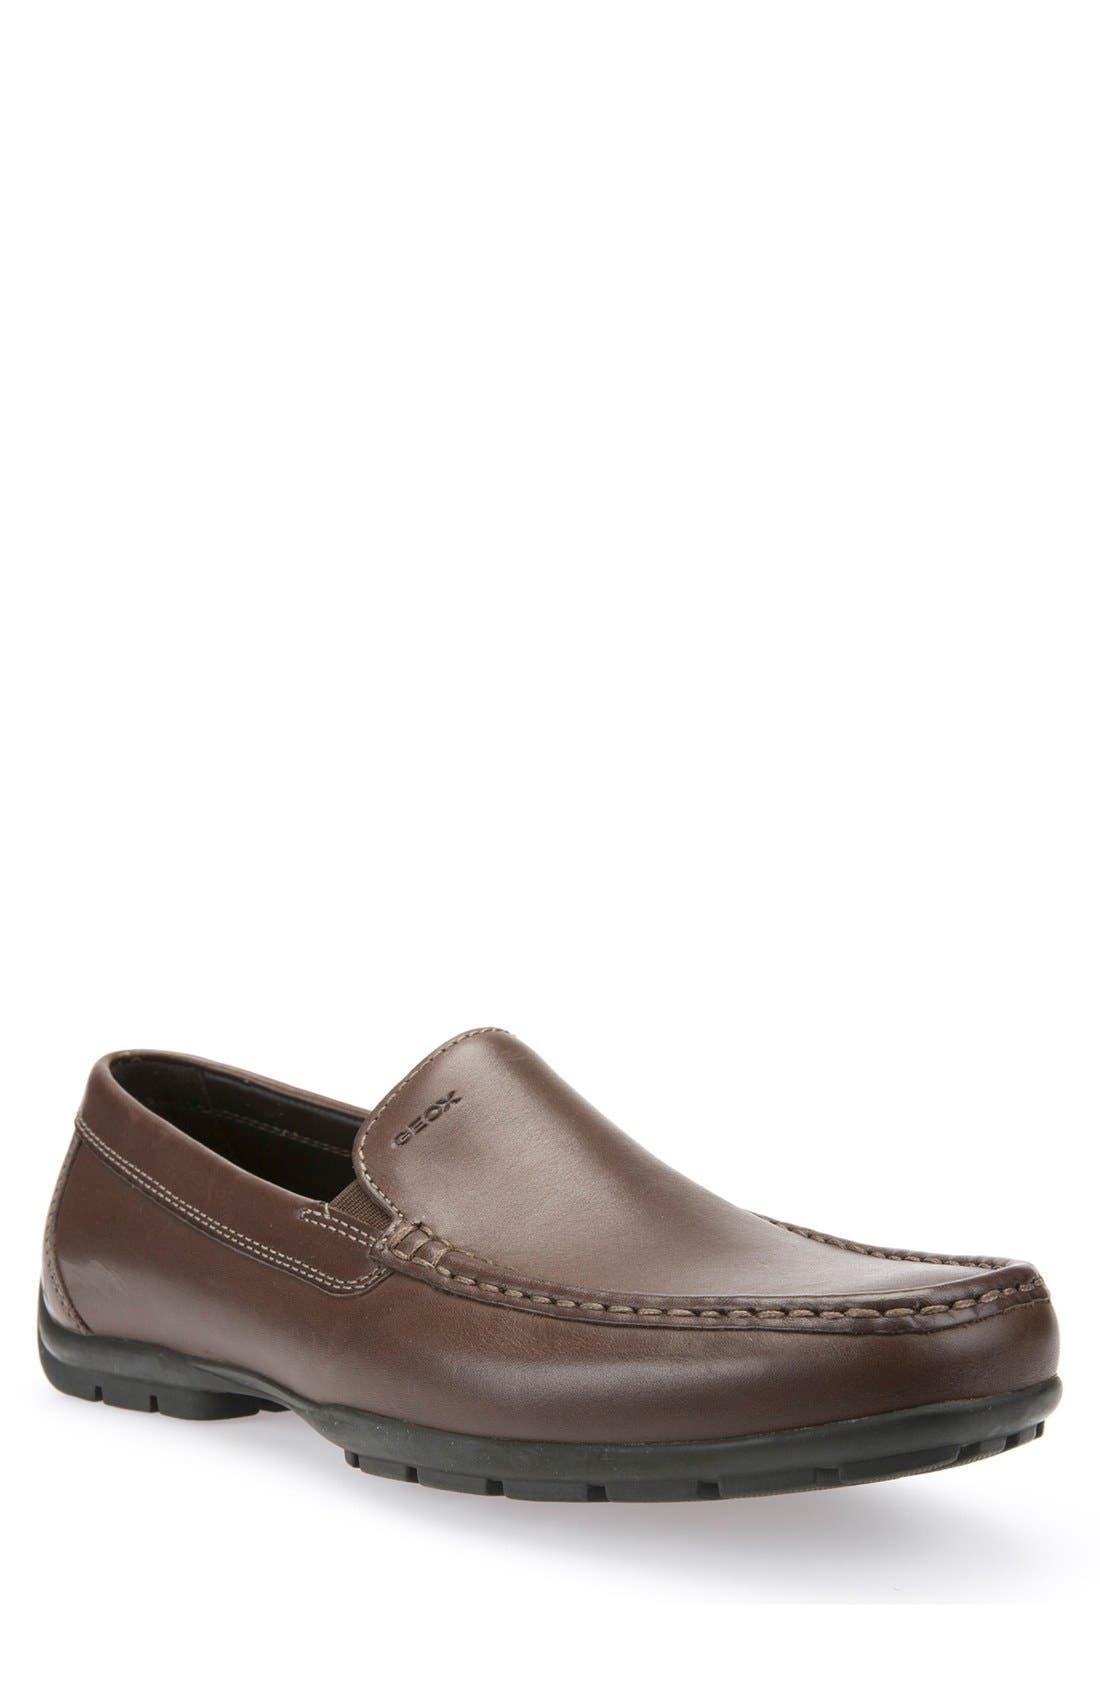 Alternate Image 1 Selected - Geox 'Monet' Driving Shoe (Men)